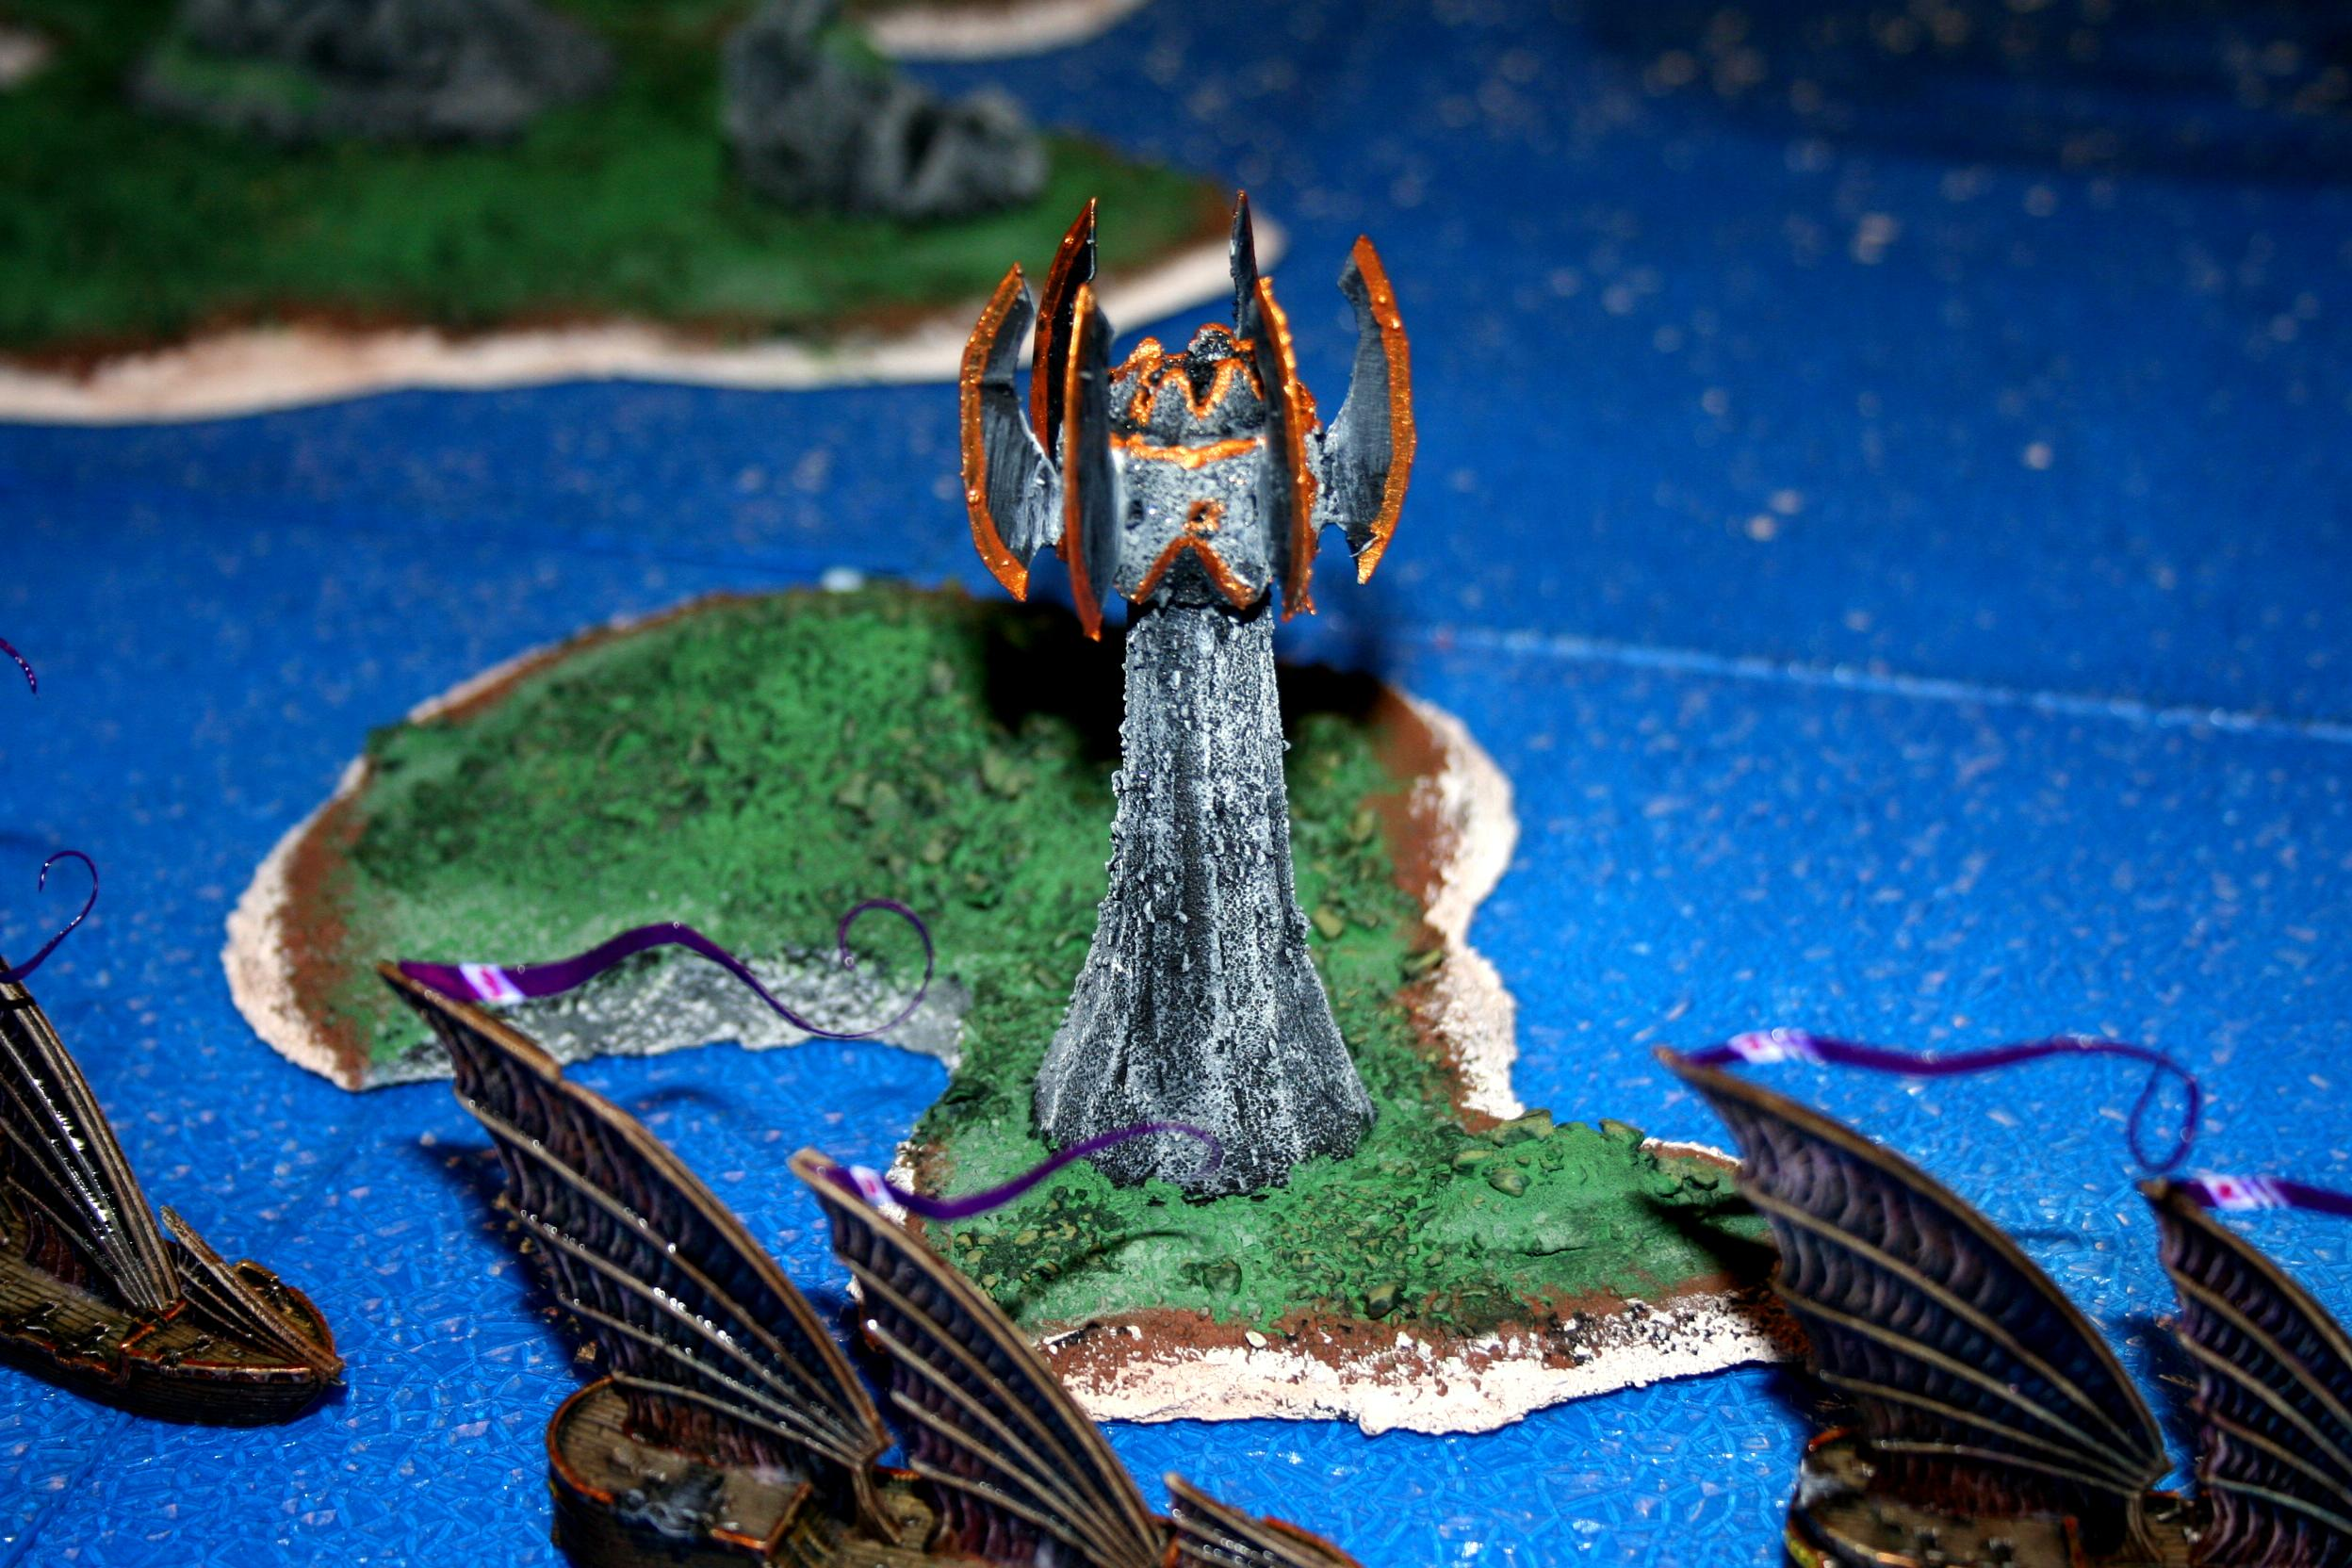 Craig, Cruiser, D6 Generation, Dragon Lords, Island, Terrain, Tower Of Sorcery, Uncharted Seas